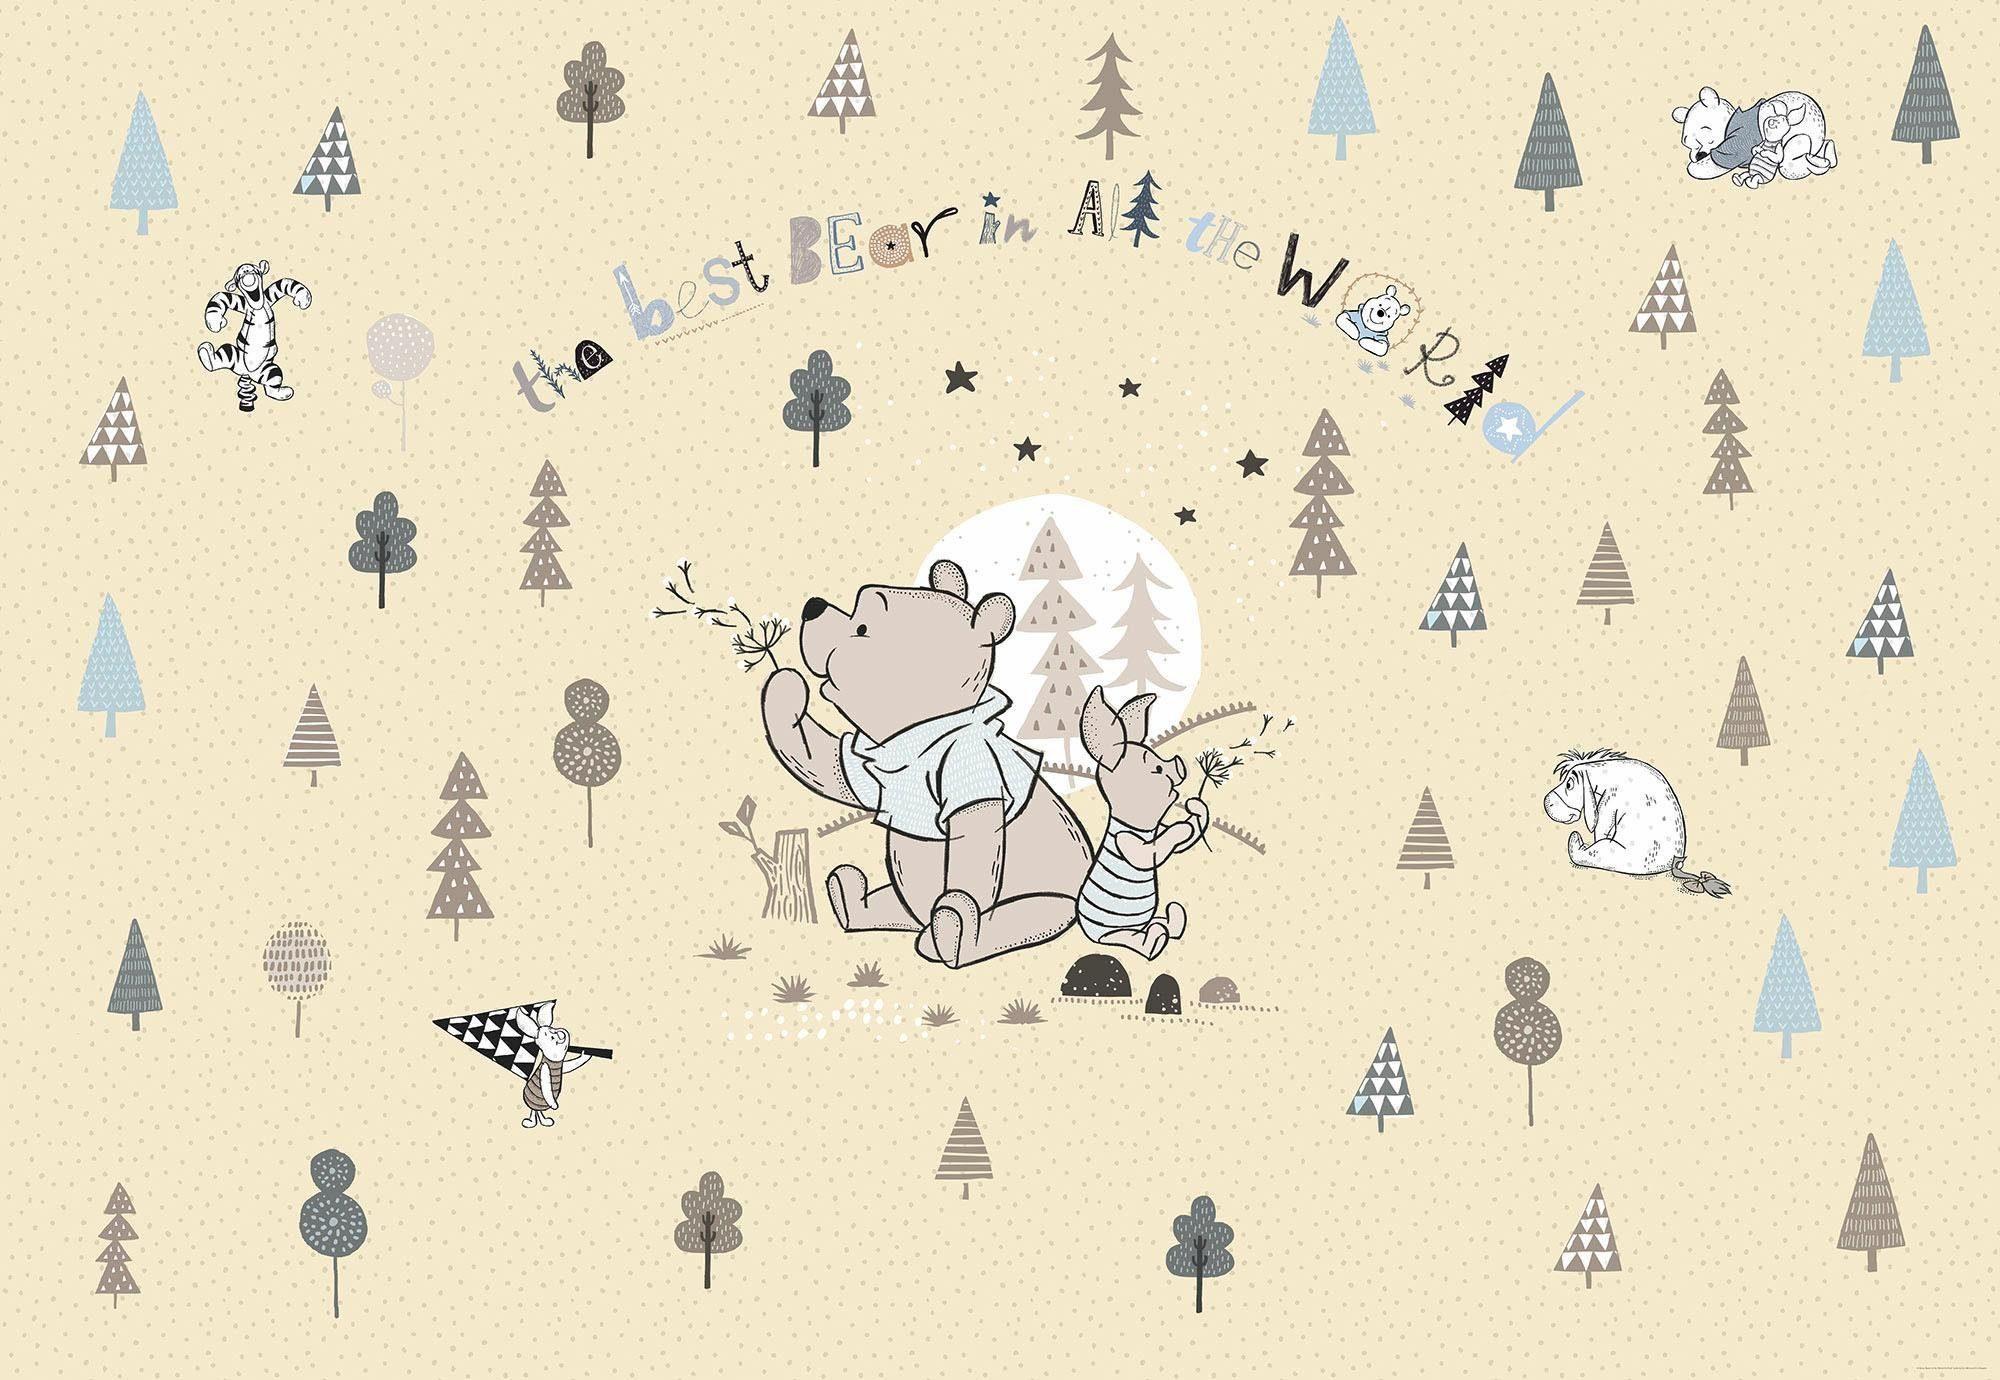 Komar Fototapete »Disney Winnie Pooh Best Bear« 368/254 cm